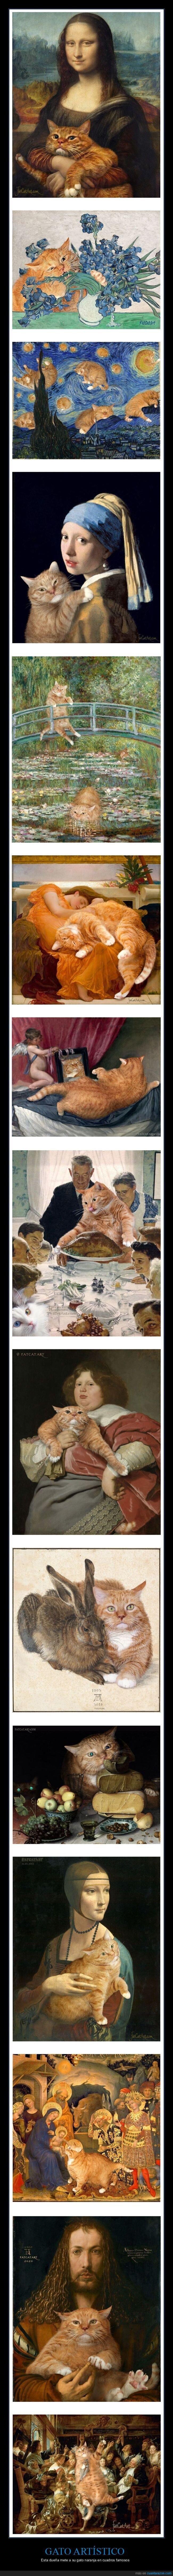 arte,cuadros,gato